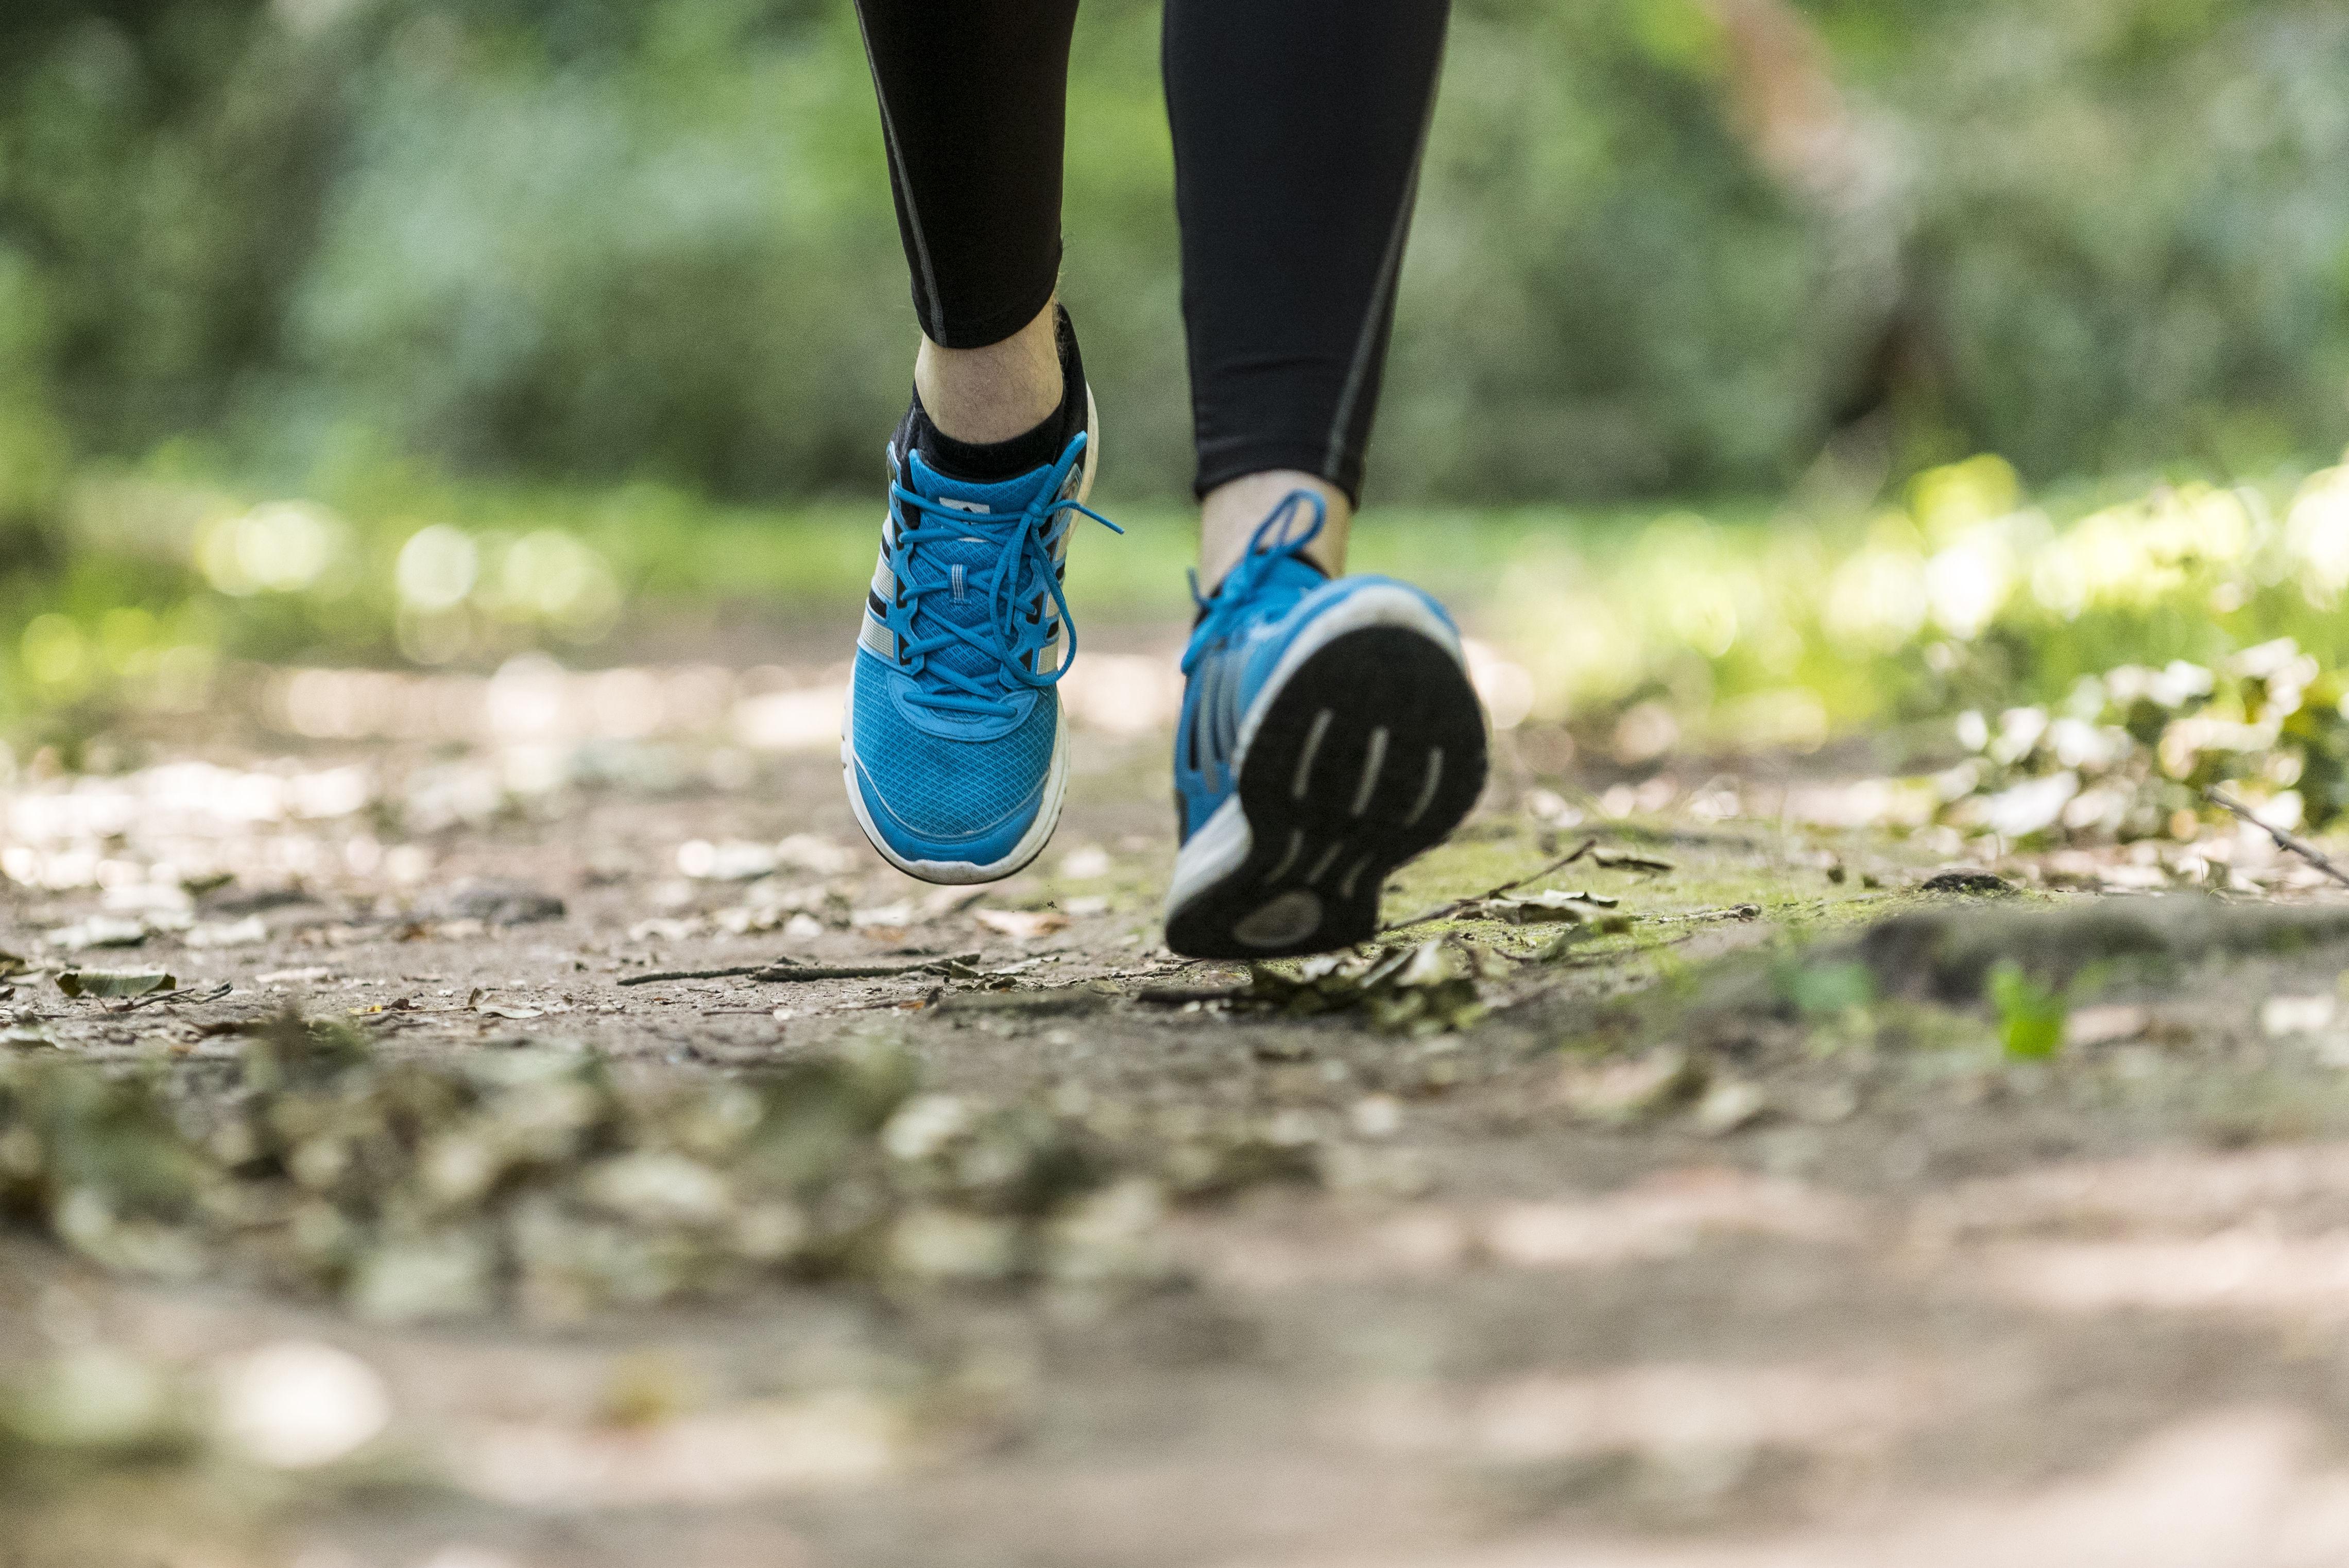 hardlopen en trailrunning natuurmonumentenHardlopen #11